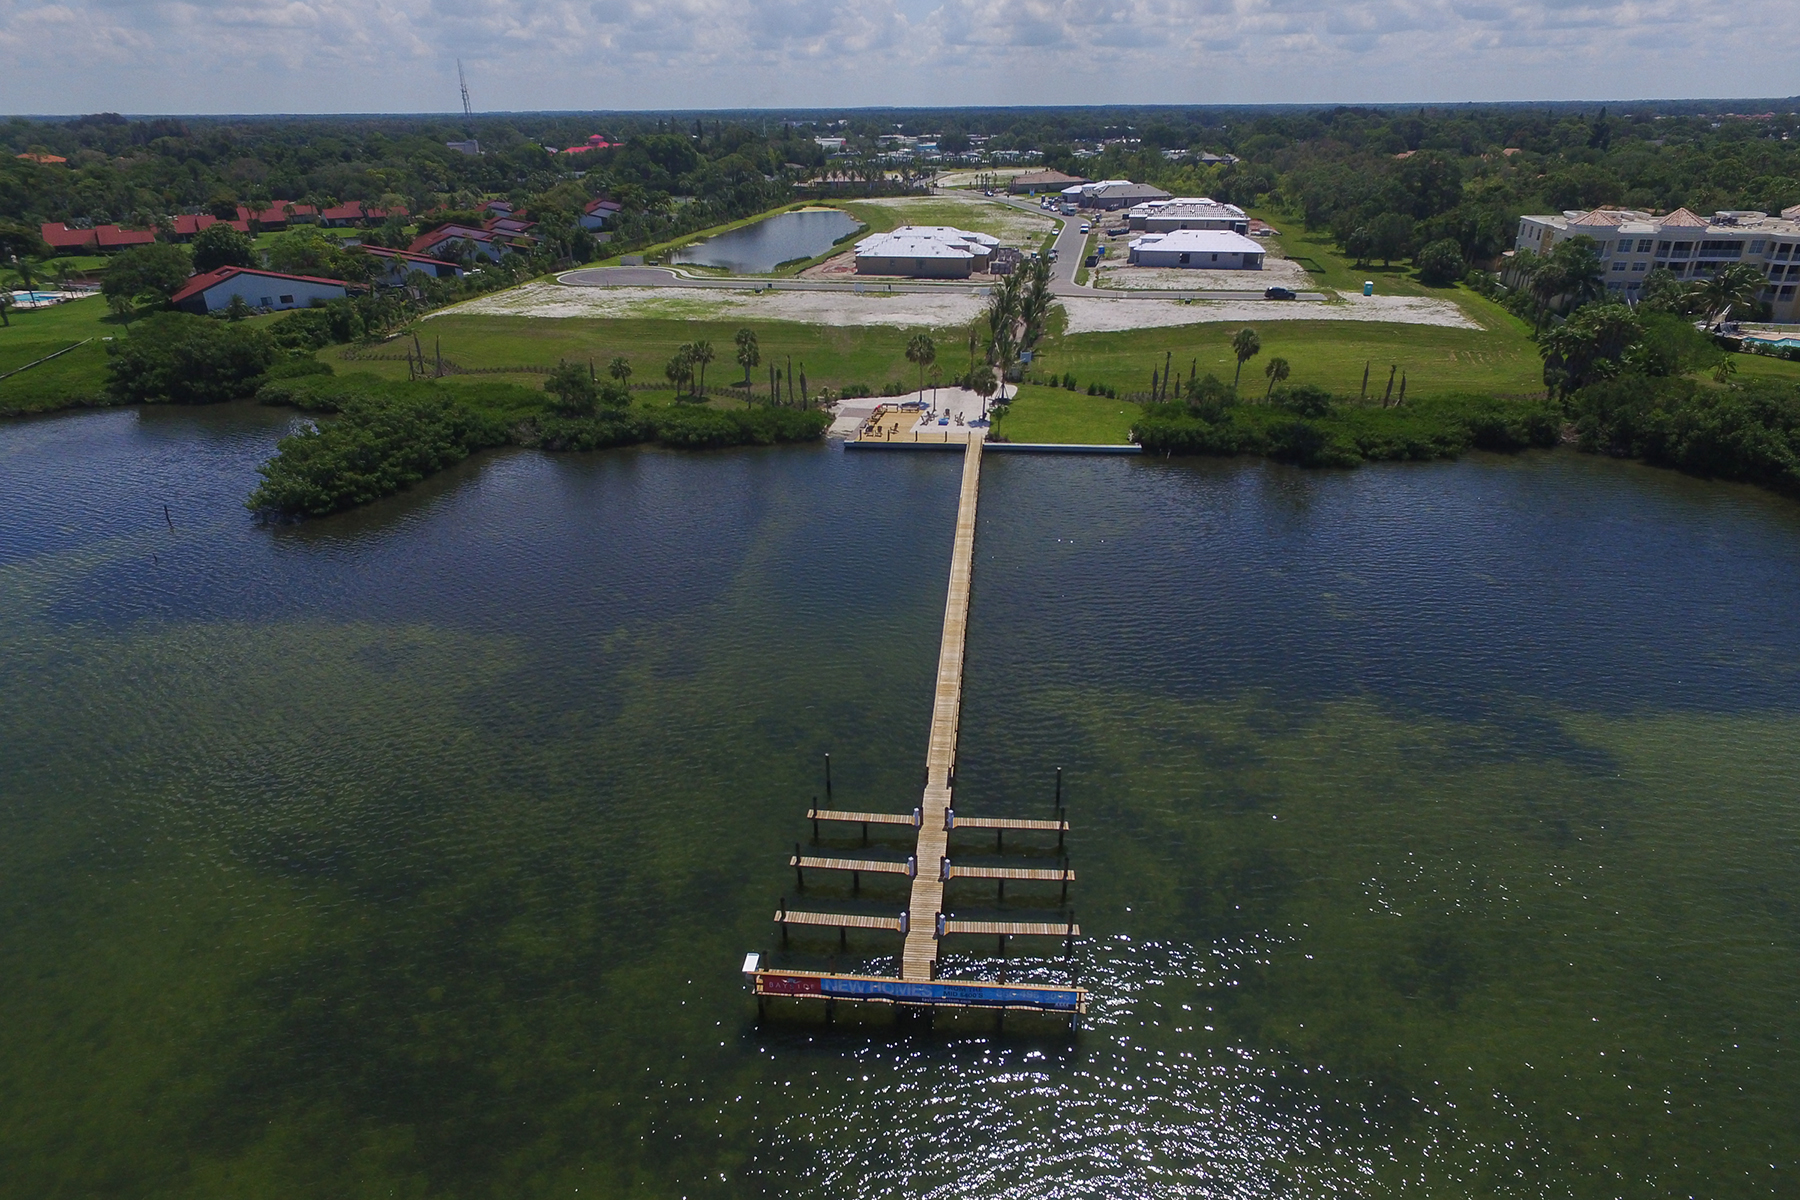 Đất đai vì Bán tại BAYSIDE 37 Masthead Dr 37 Osprey, Florida, 34229 Hoa Kỳ